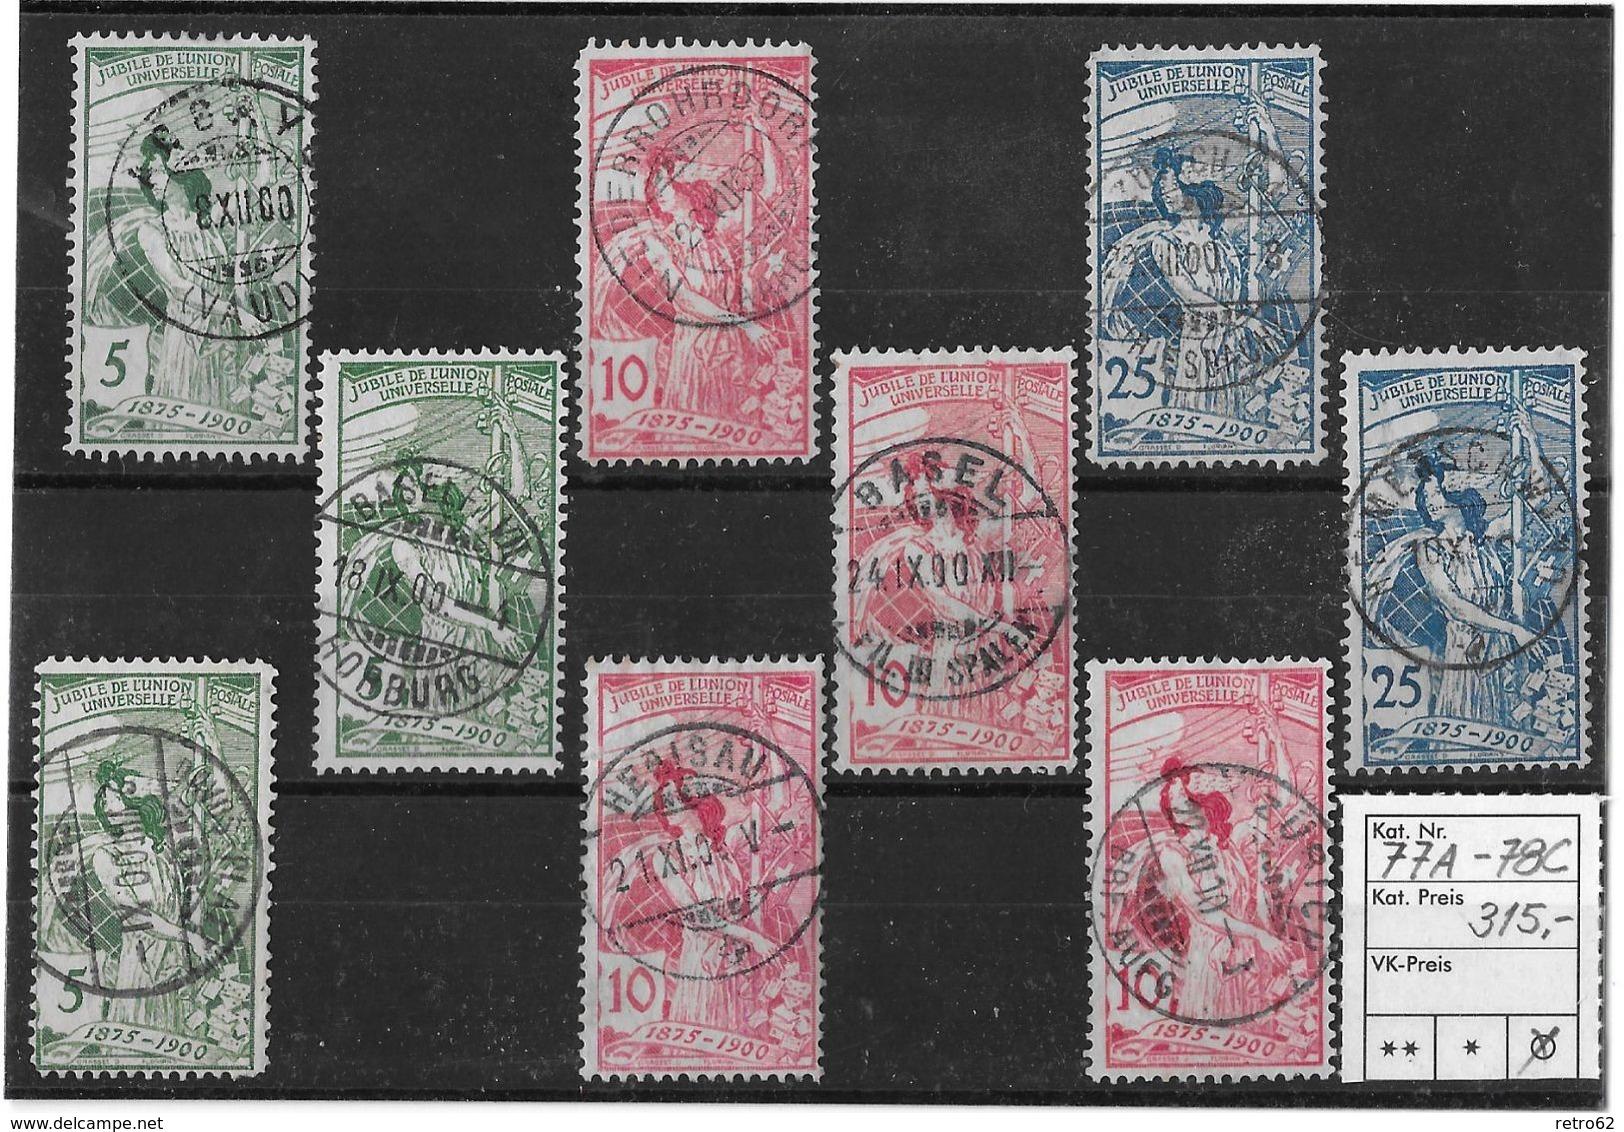 1900  2. Juli, 25 Jahre Weltpostverein / Jubilé De L'U.P.U. Mit ZT.guten Stempel ►SBK-77A-78C◄ - 1882-1906 Coat Of Arms, Standing Helvetia & UPU